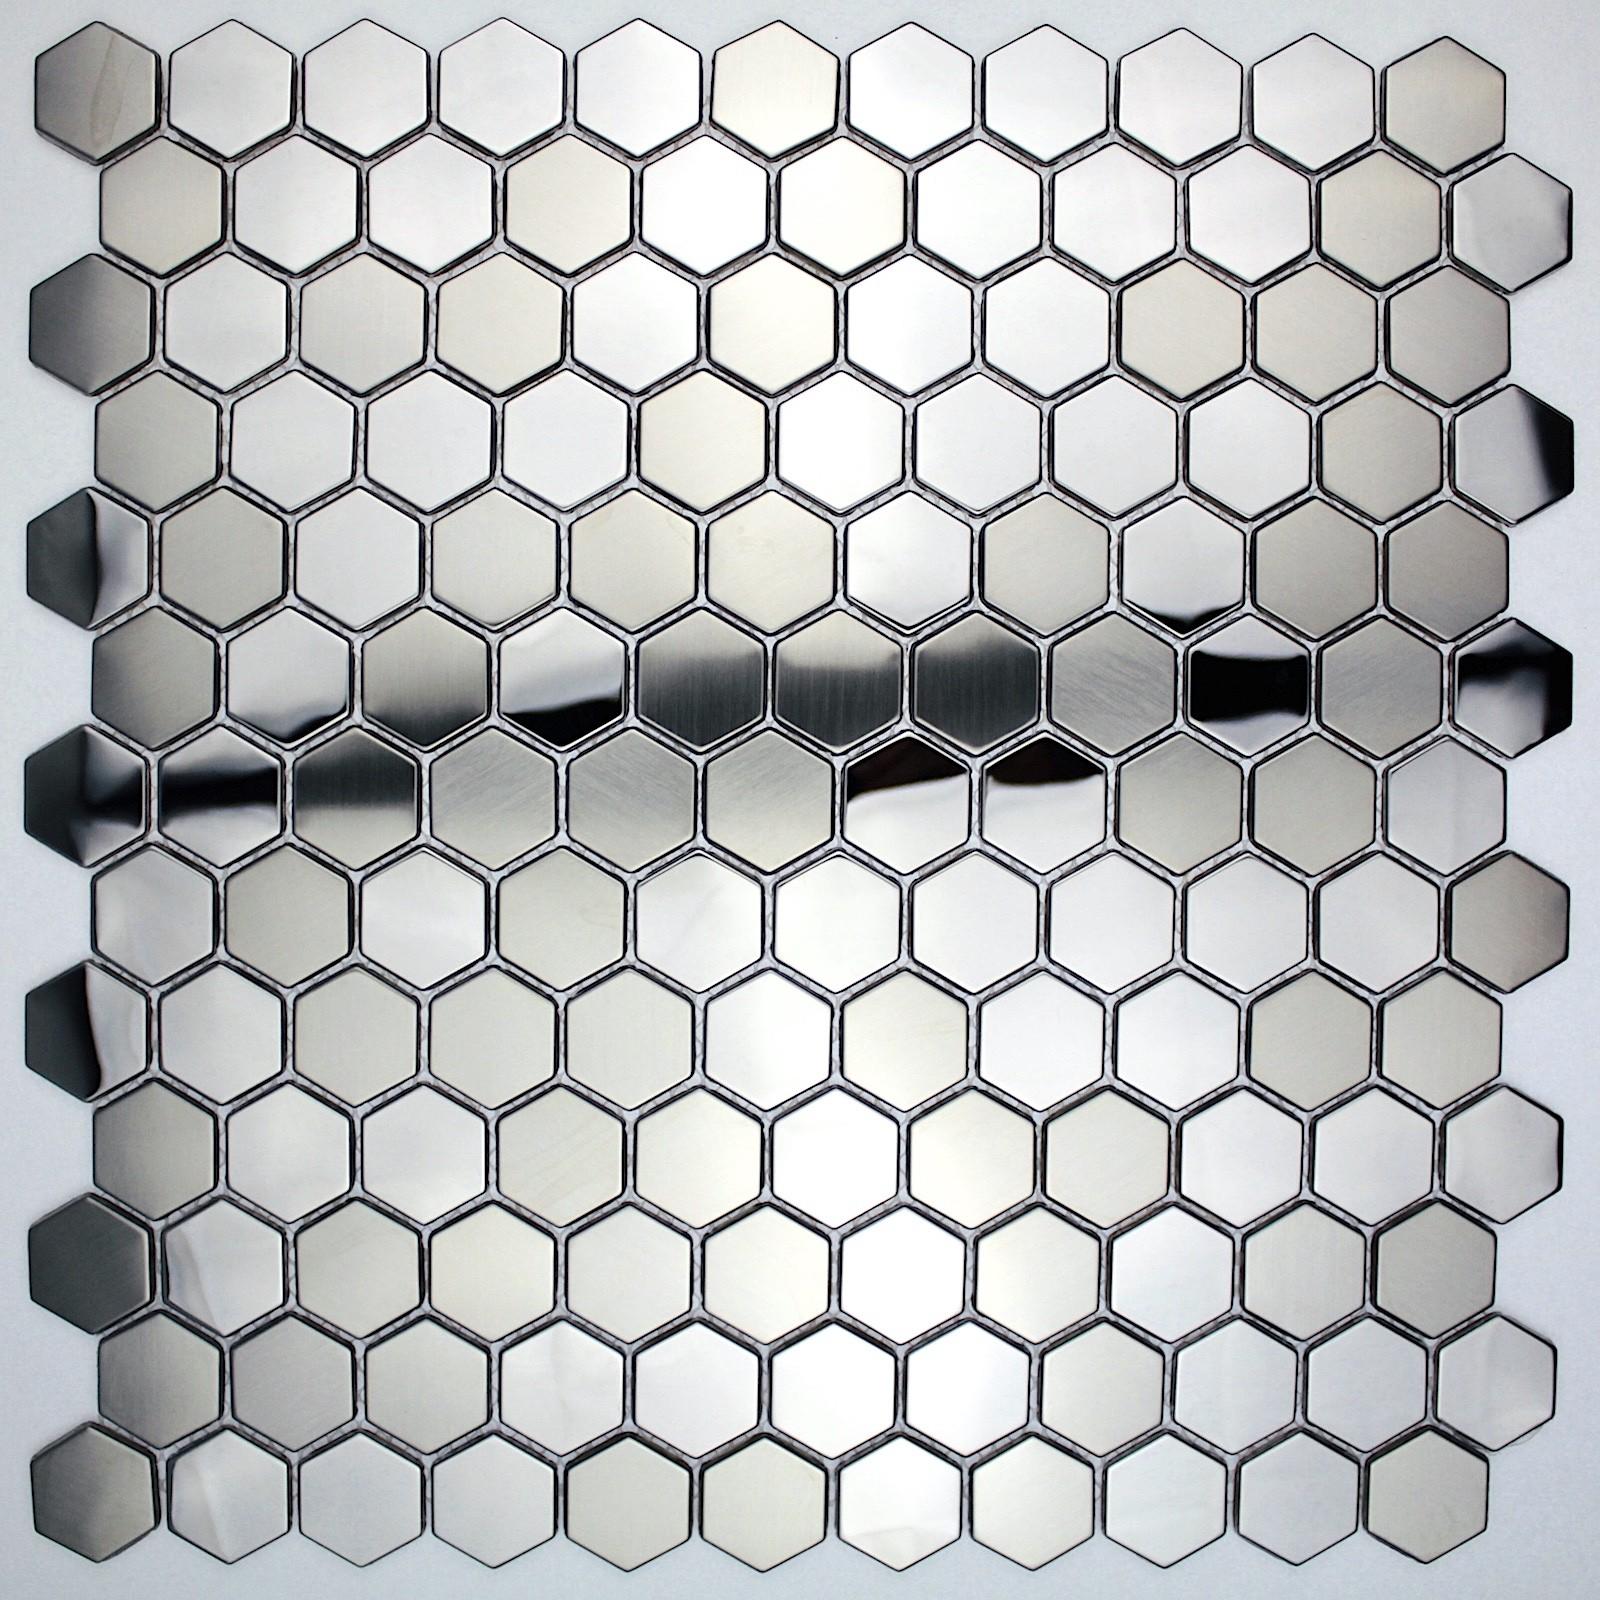 - Kitchen With A Honeycomb Mosaic Tile Backsplash - ERIGIESTUDIO